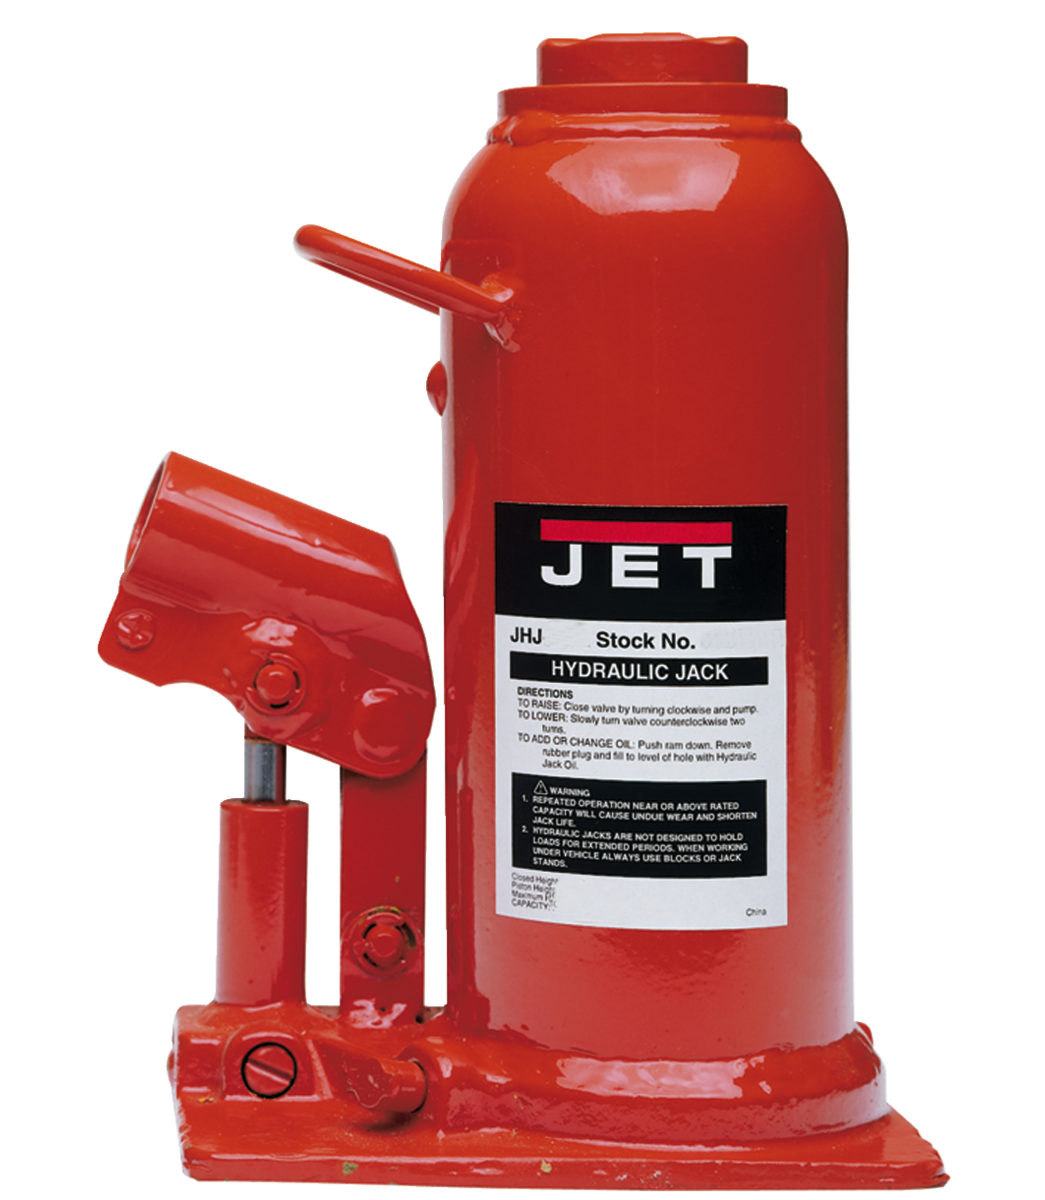 JHJ-5, 5-Ton Hydraulic Bottle Jack